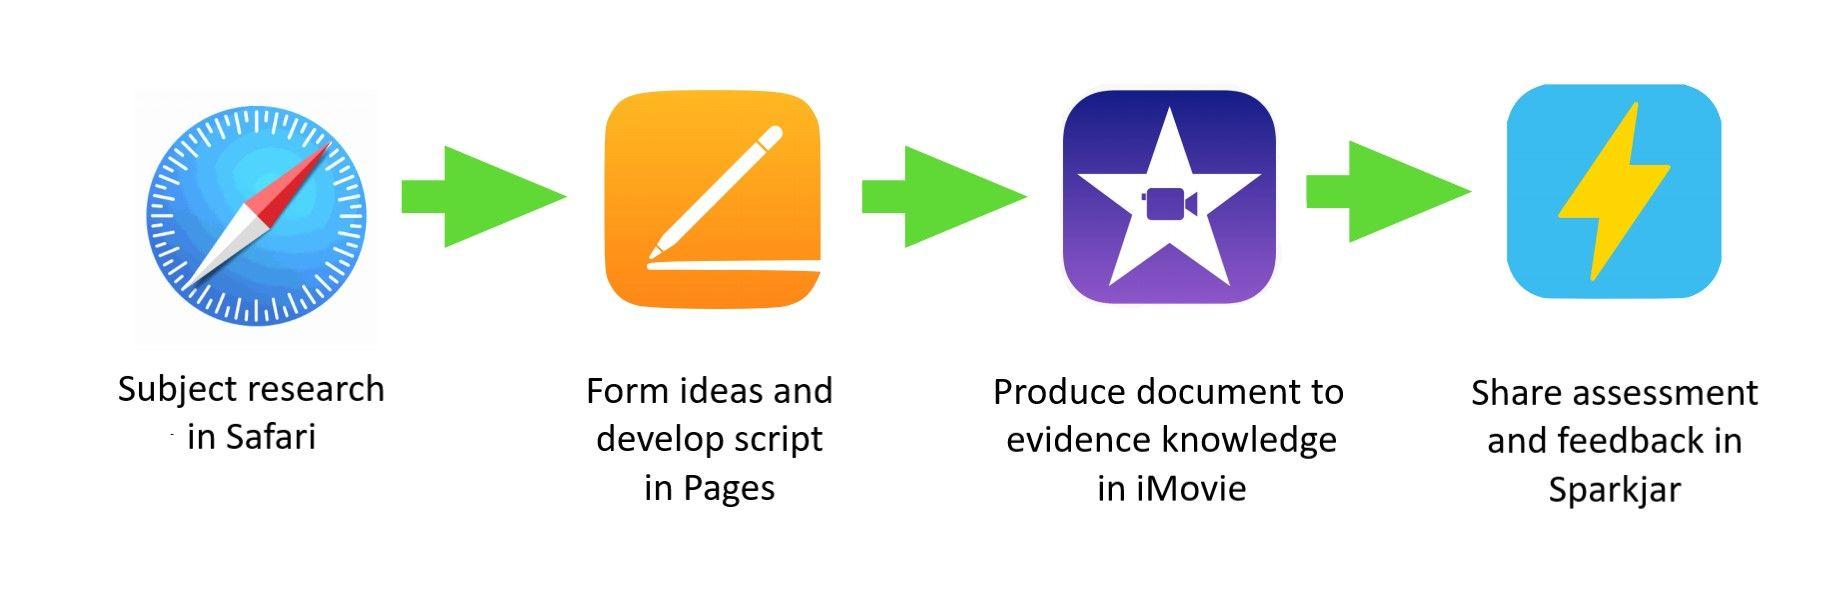 app-flow-amended